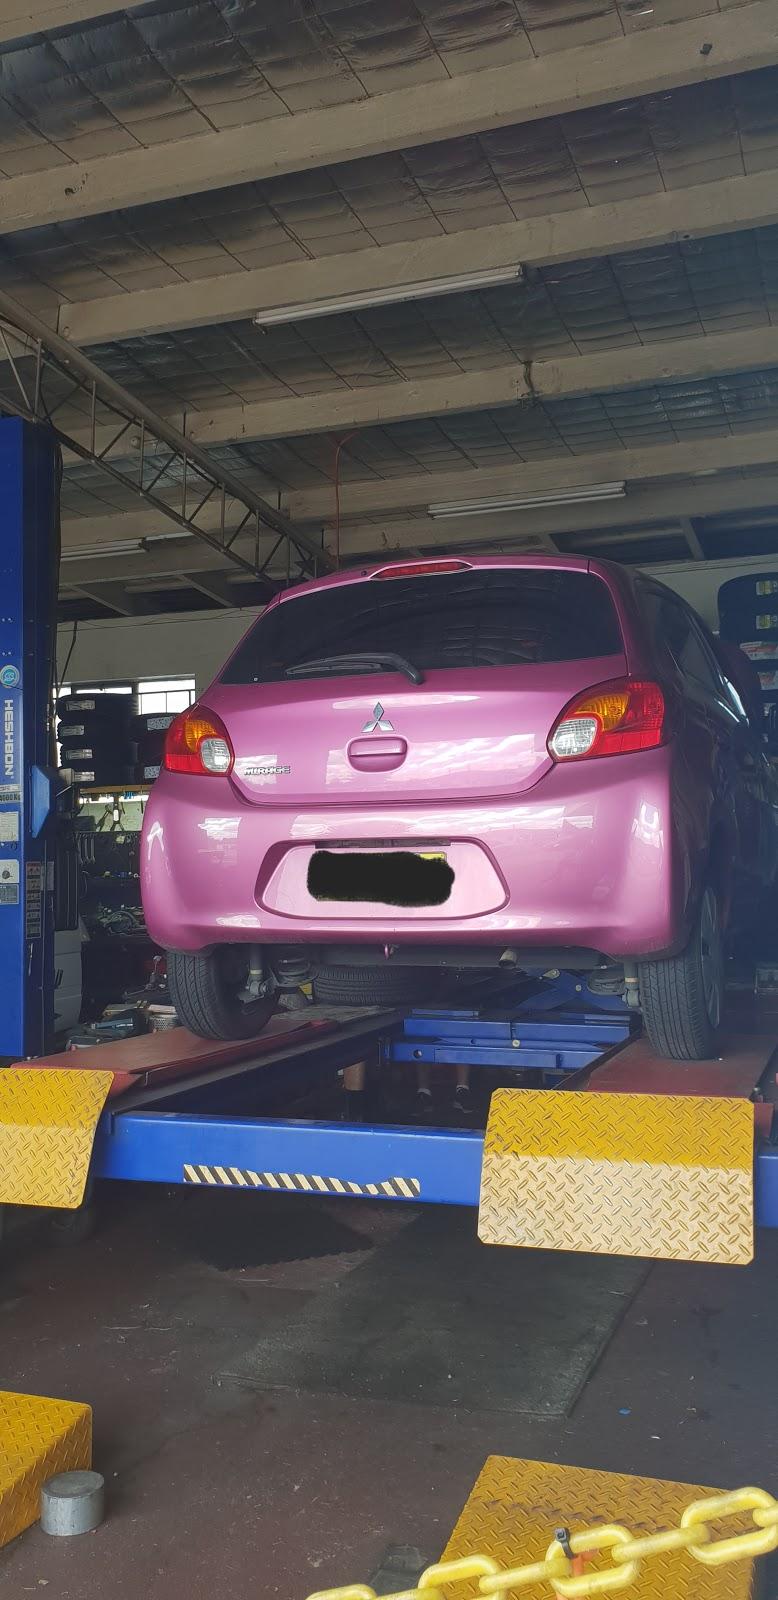 Hilltop Car Care | car repair | 1A Hilltop Rd, Merrylands NSW 2160, Australia | 0298911717 OR +61 2 9891 1717